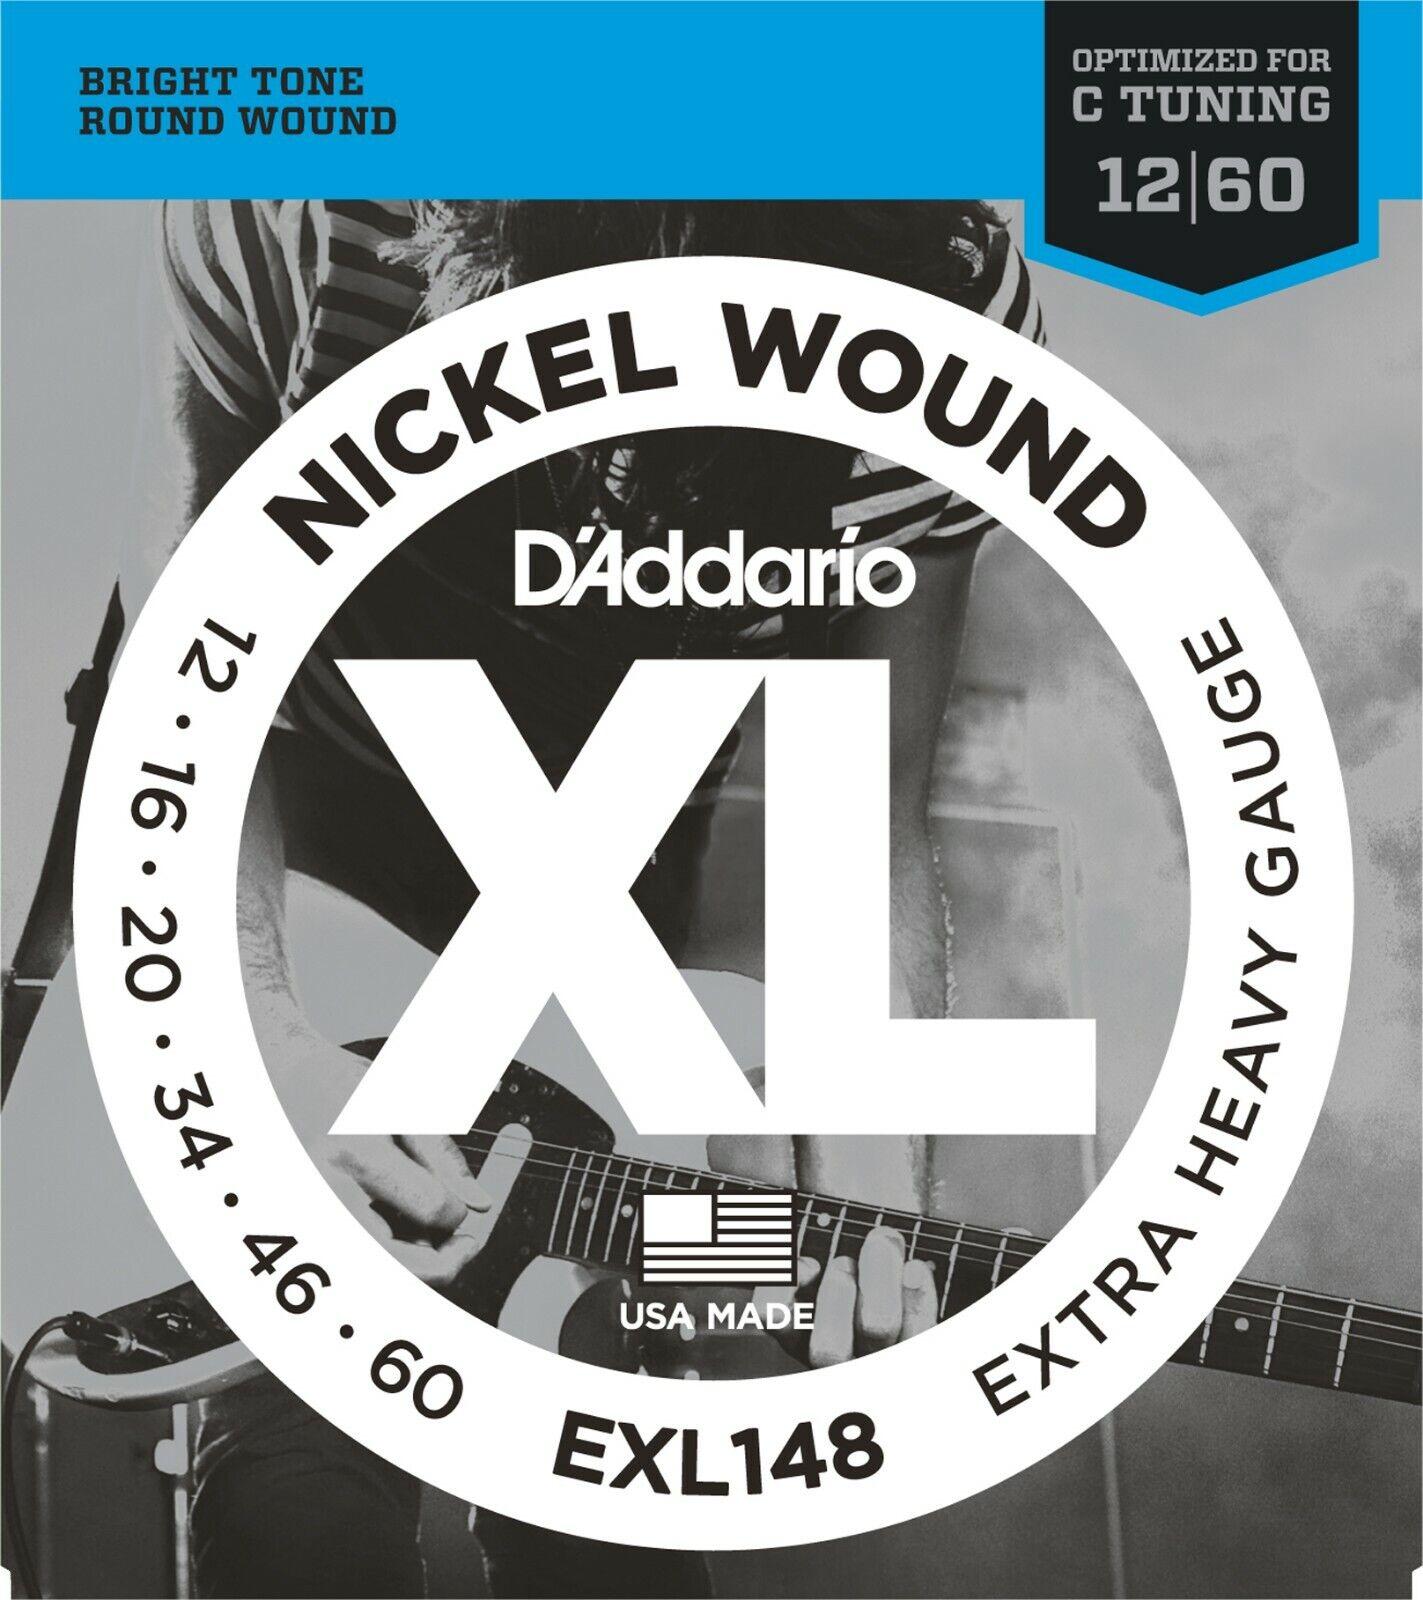 10 sets D'Addario EXL148 Electric Guitar Strings 12-60 Heavy